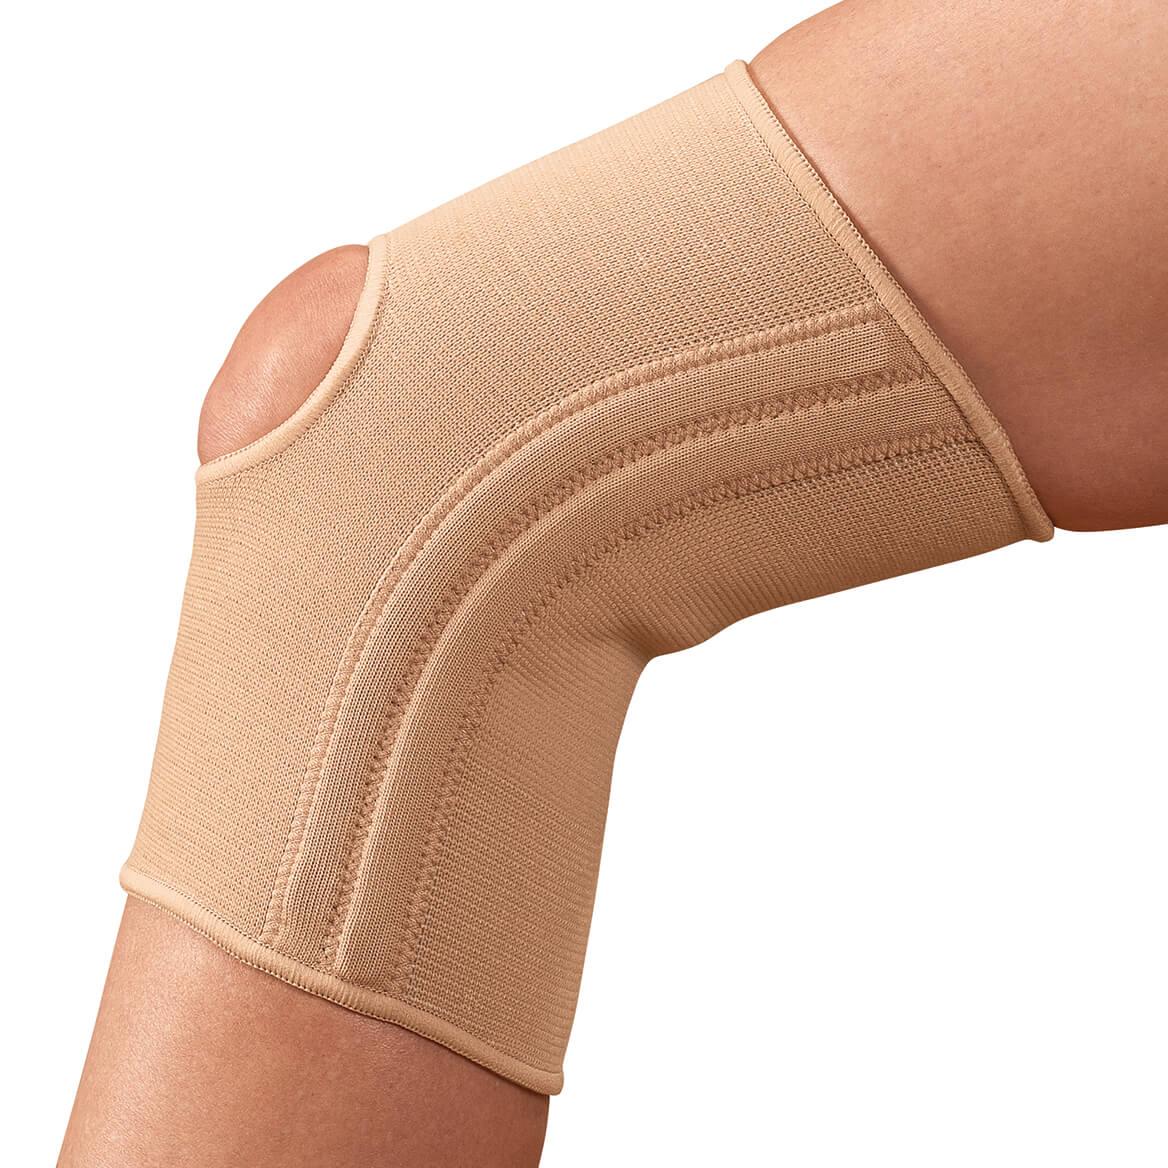 Antibacterial Deluxe Nylon Knee Support - Miles Kimball